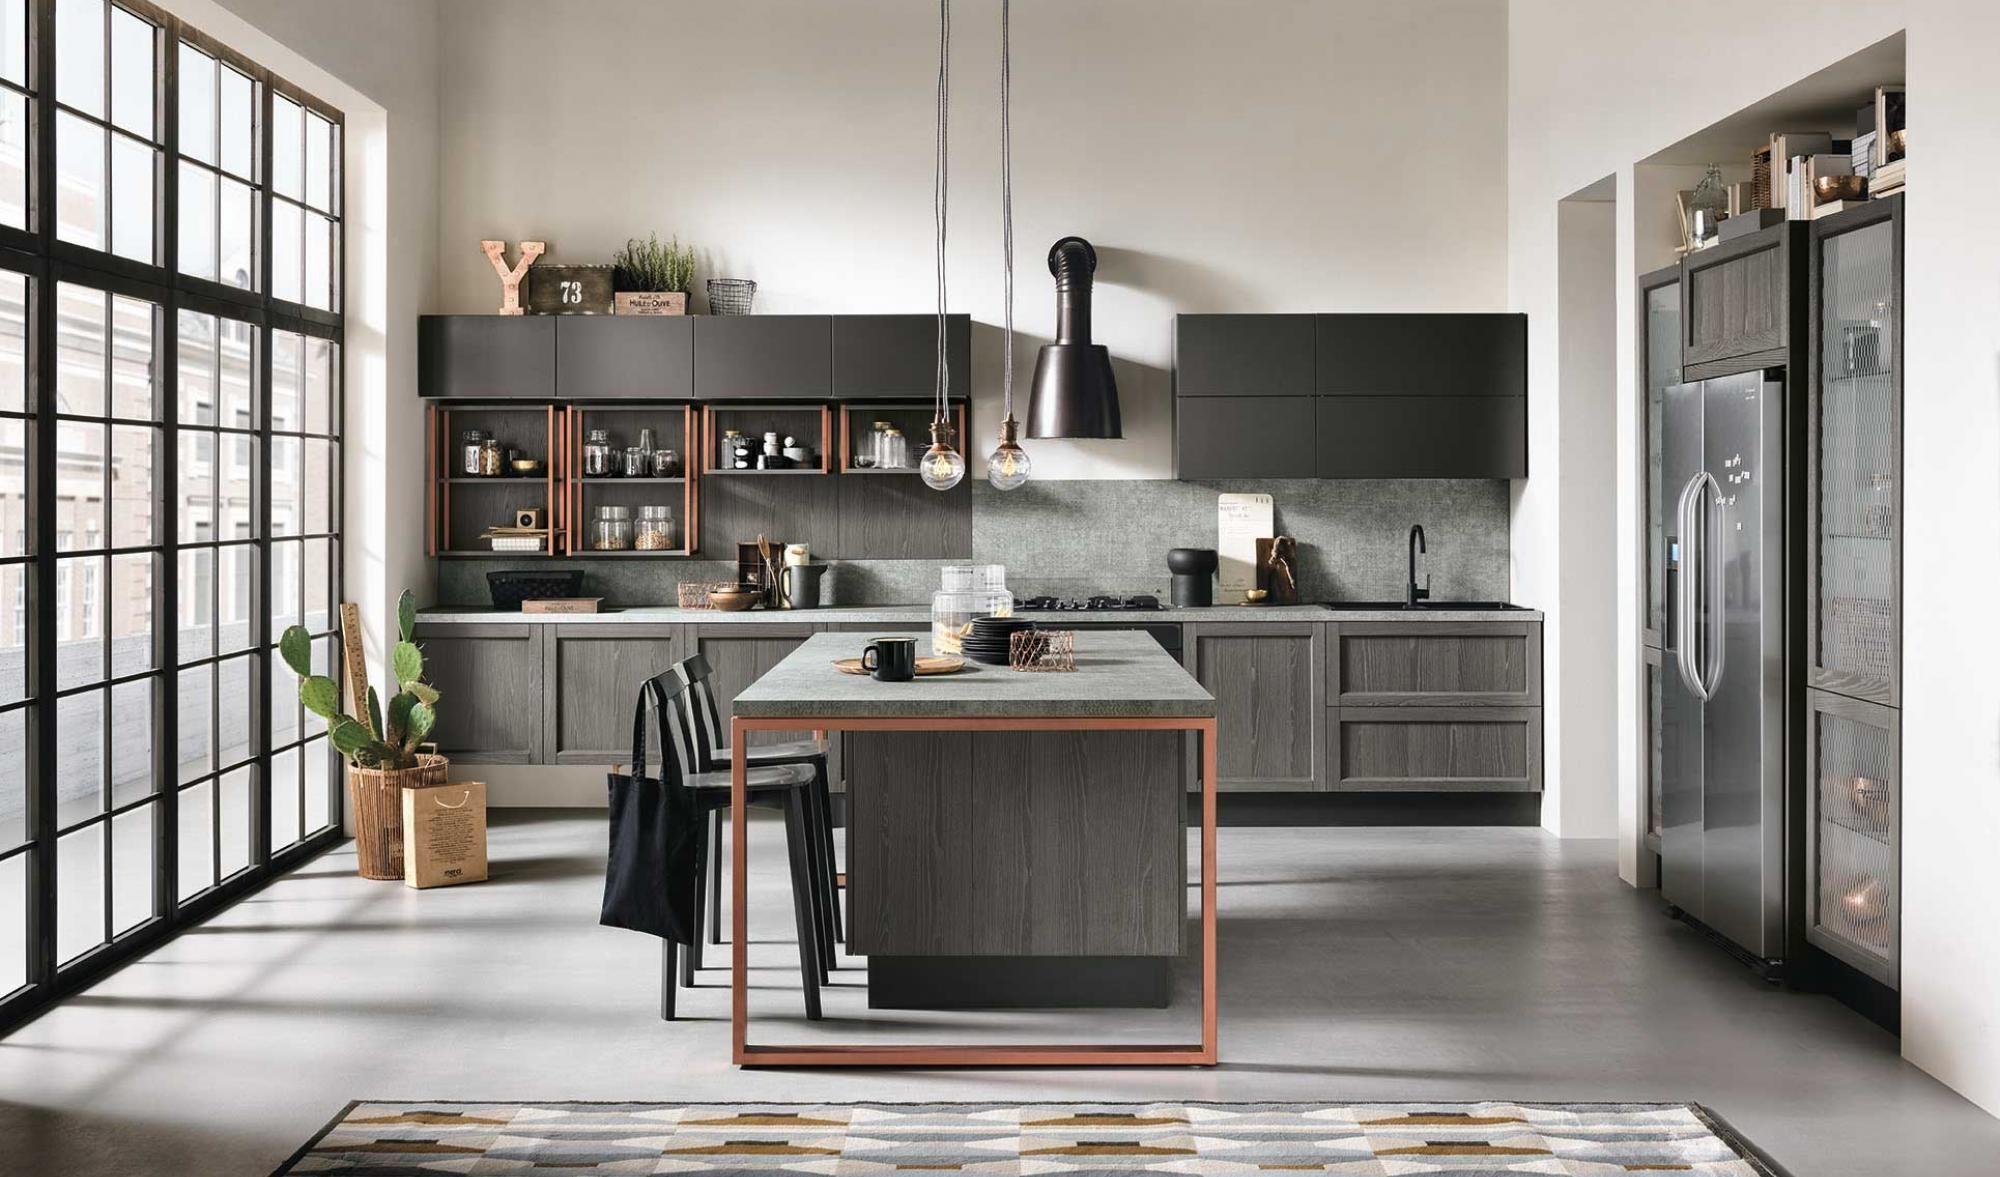 Artec talea novit cucina urban country style l for Arredamento stile